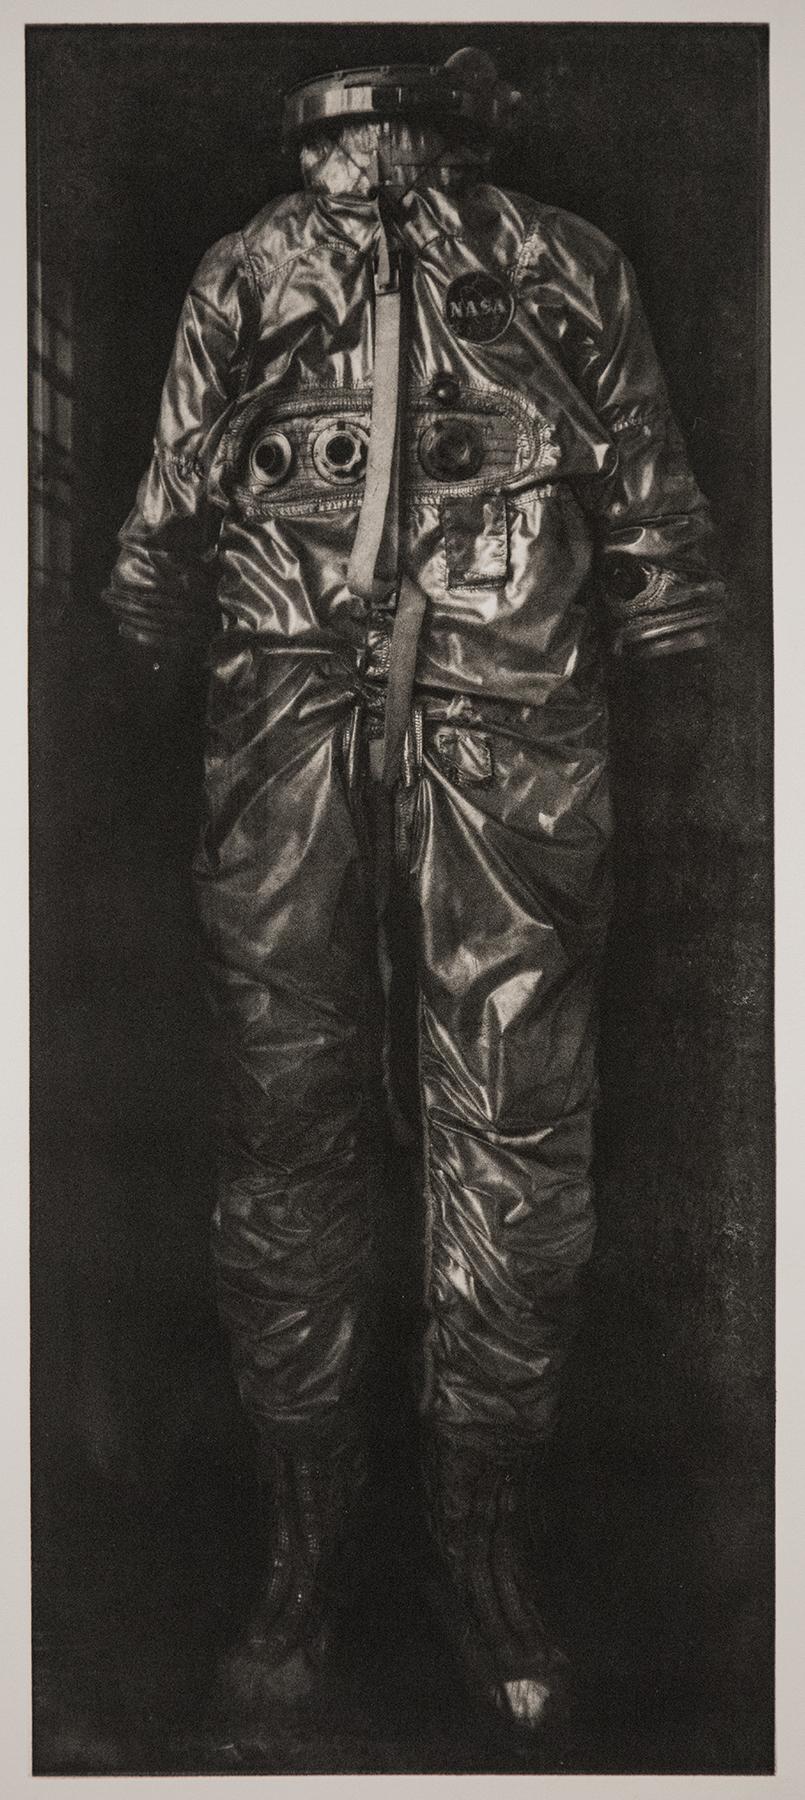 Mercury Space Flight Suit - Huntsville